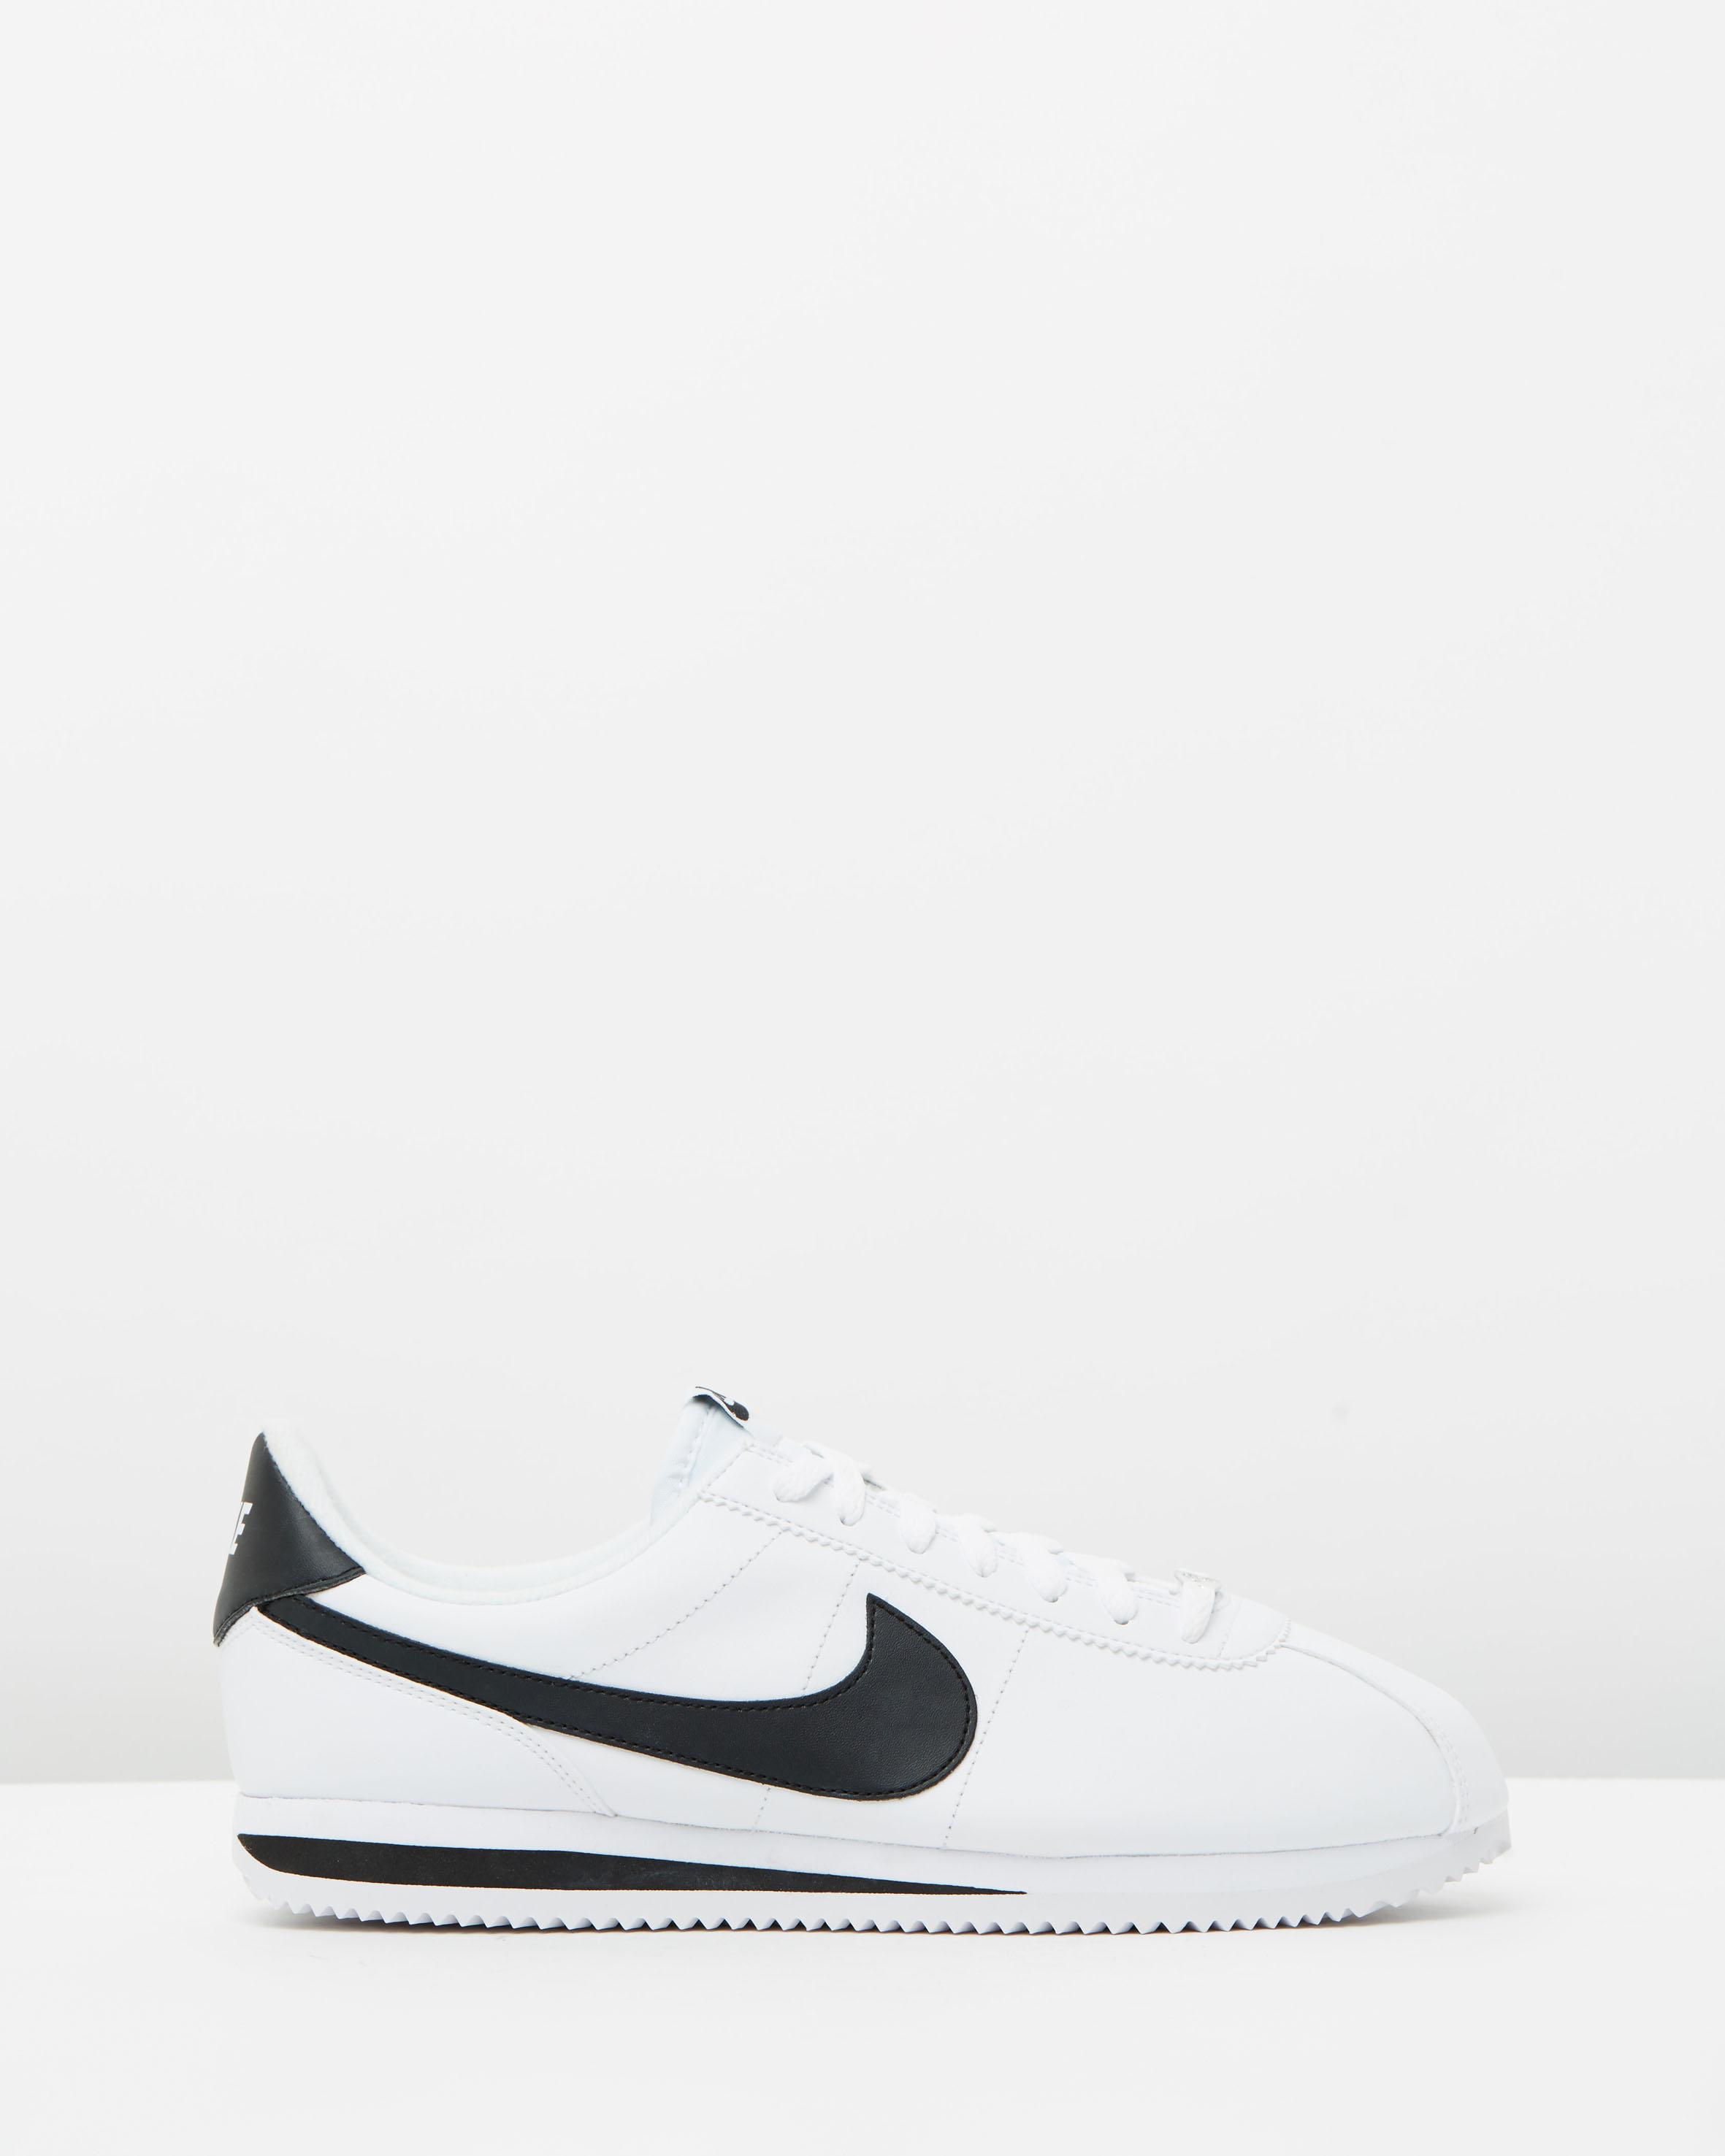 buy popular e1807 64301 Nike Cortez Basic Leather White, Black & Metallic Silver